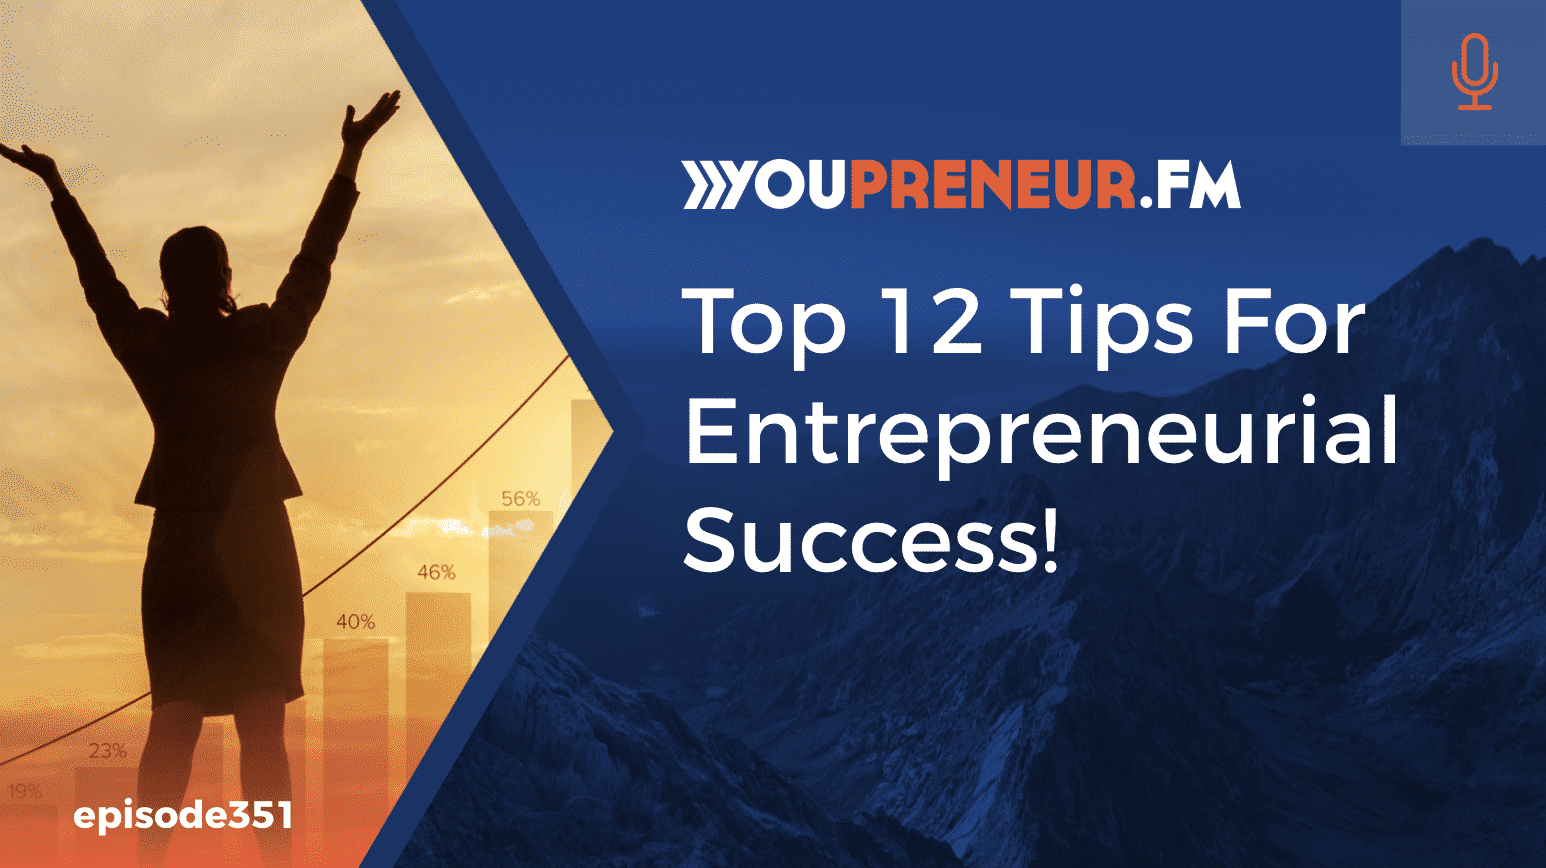 Top 12 Tips for Entrepreneurial Success